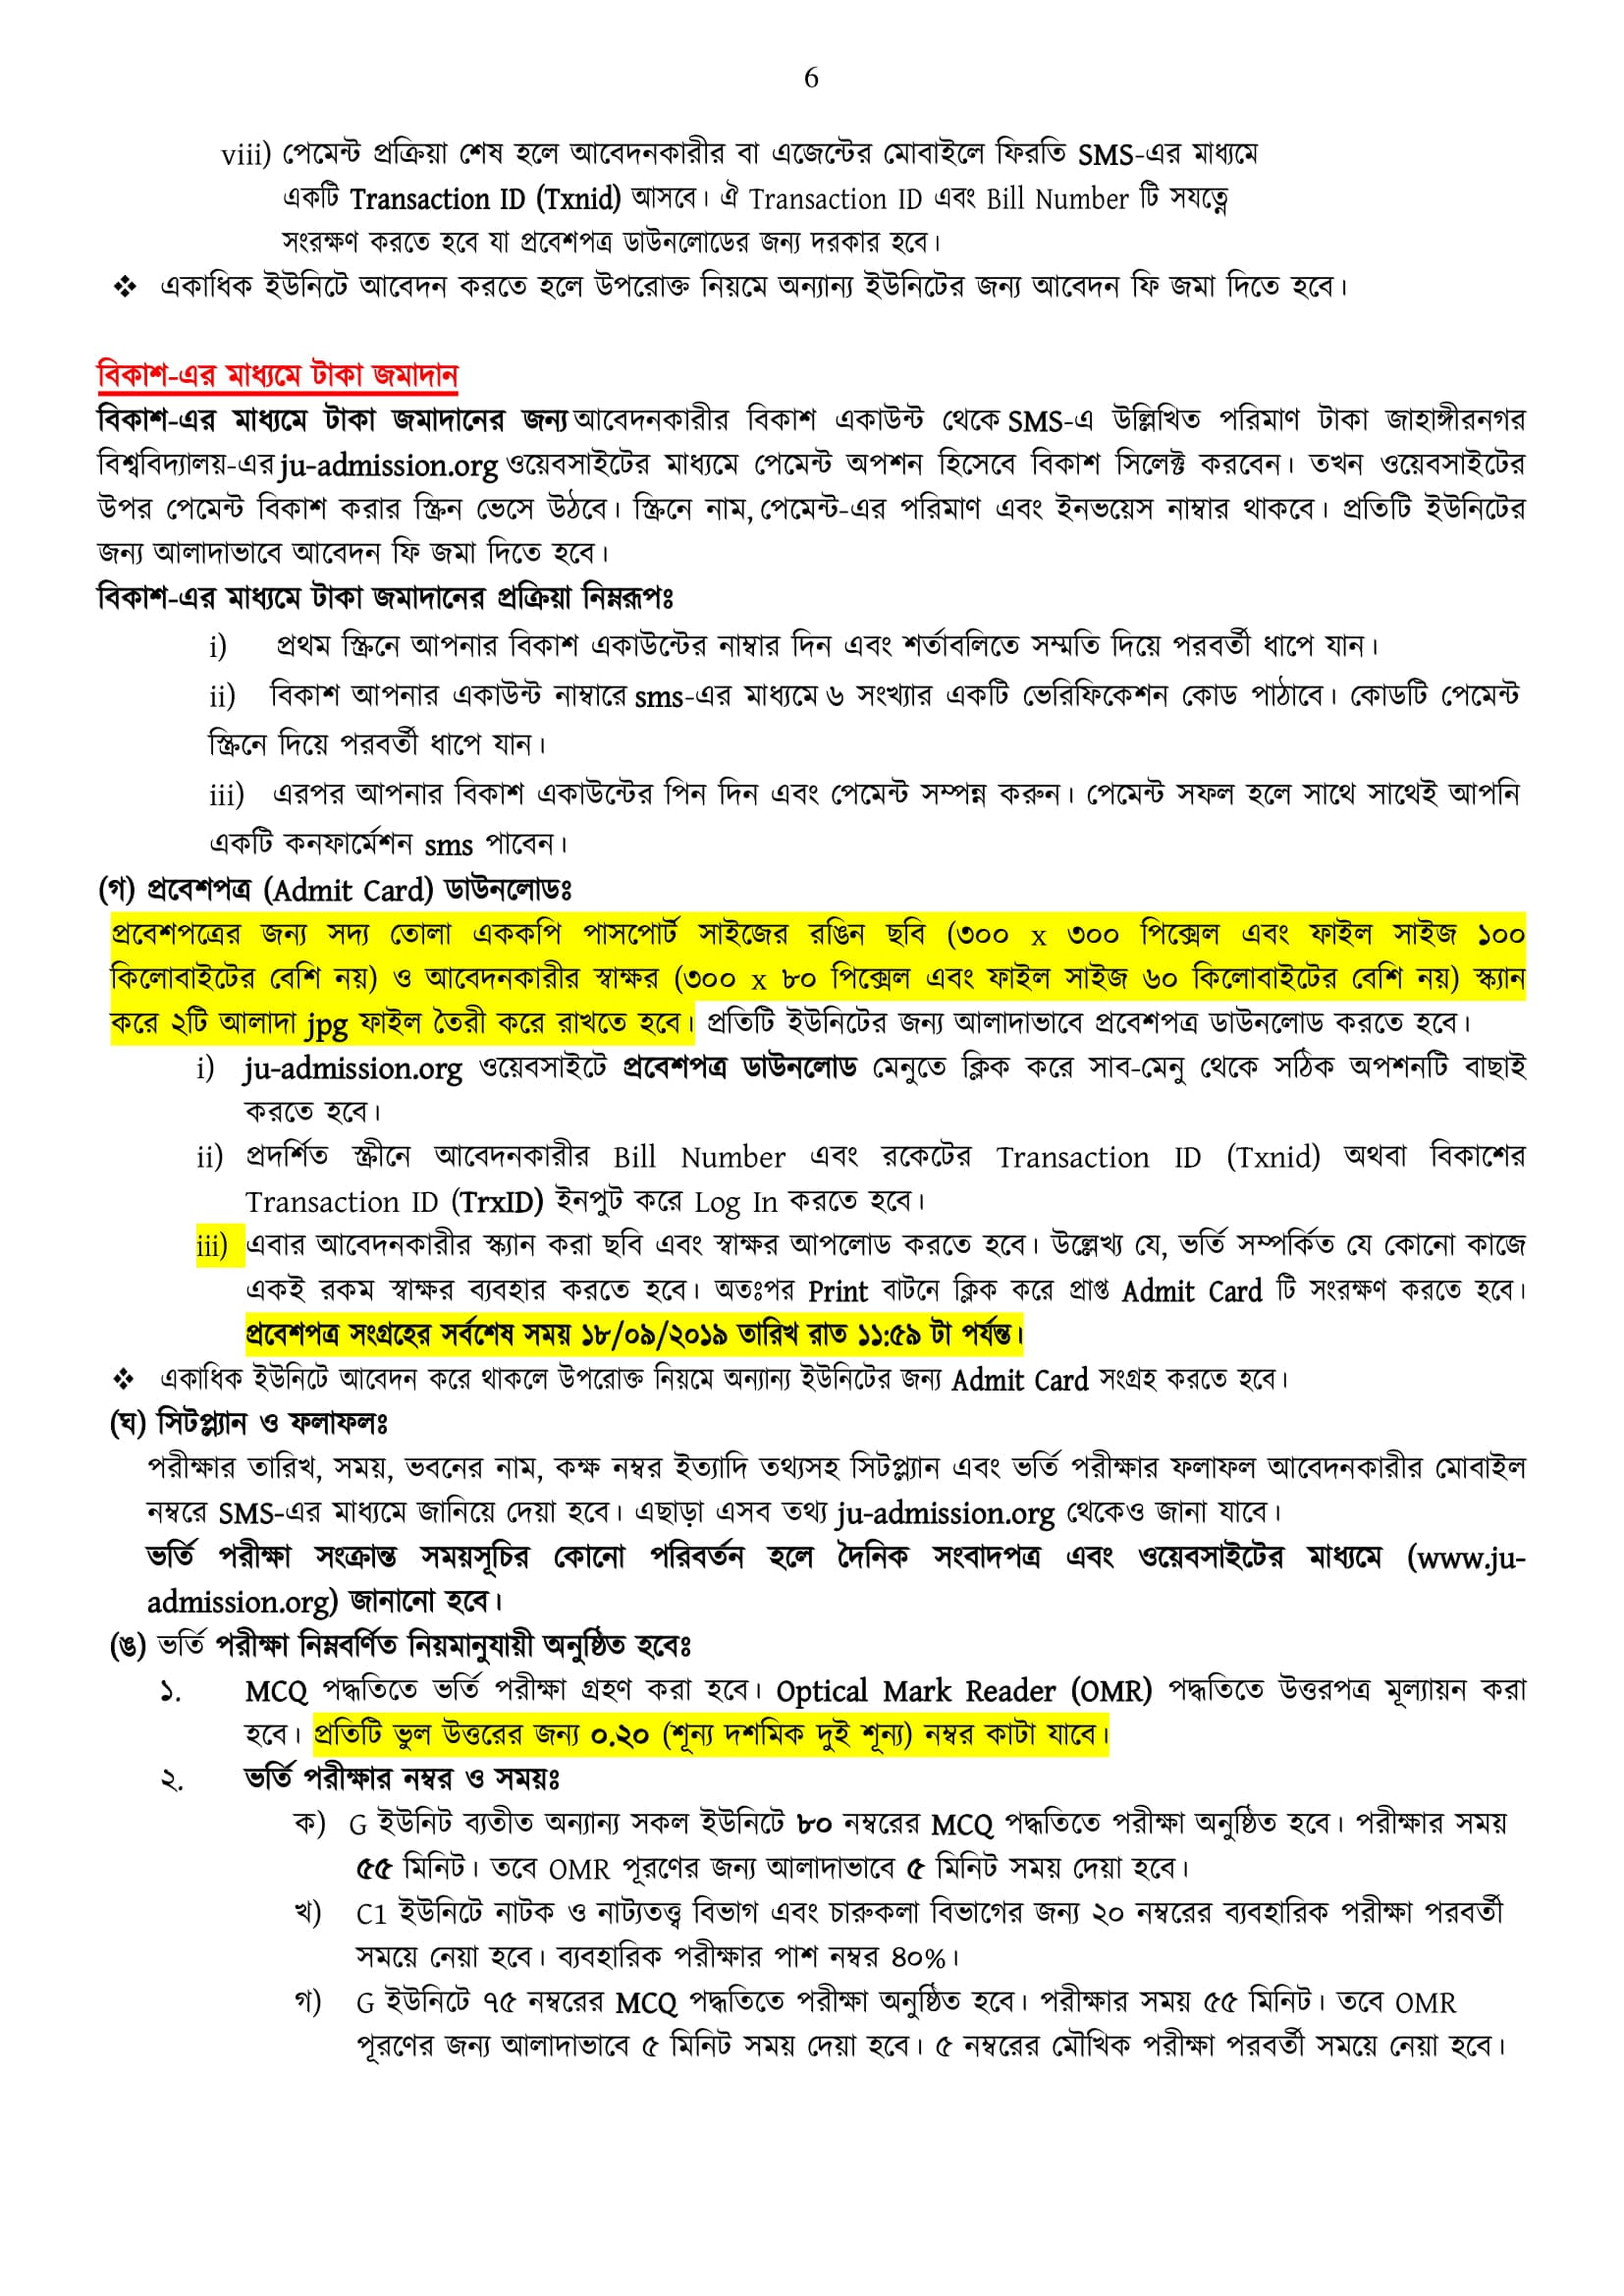 Jahangirnagar University Admission Circular 2019-20 6